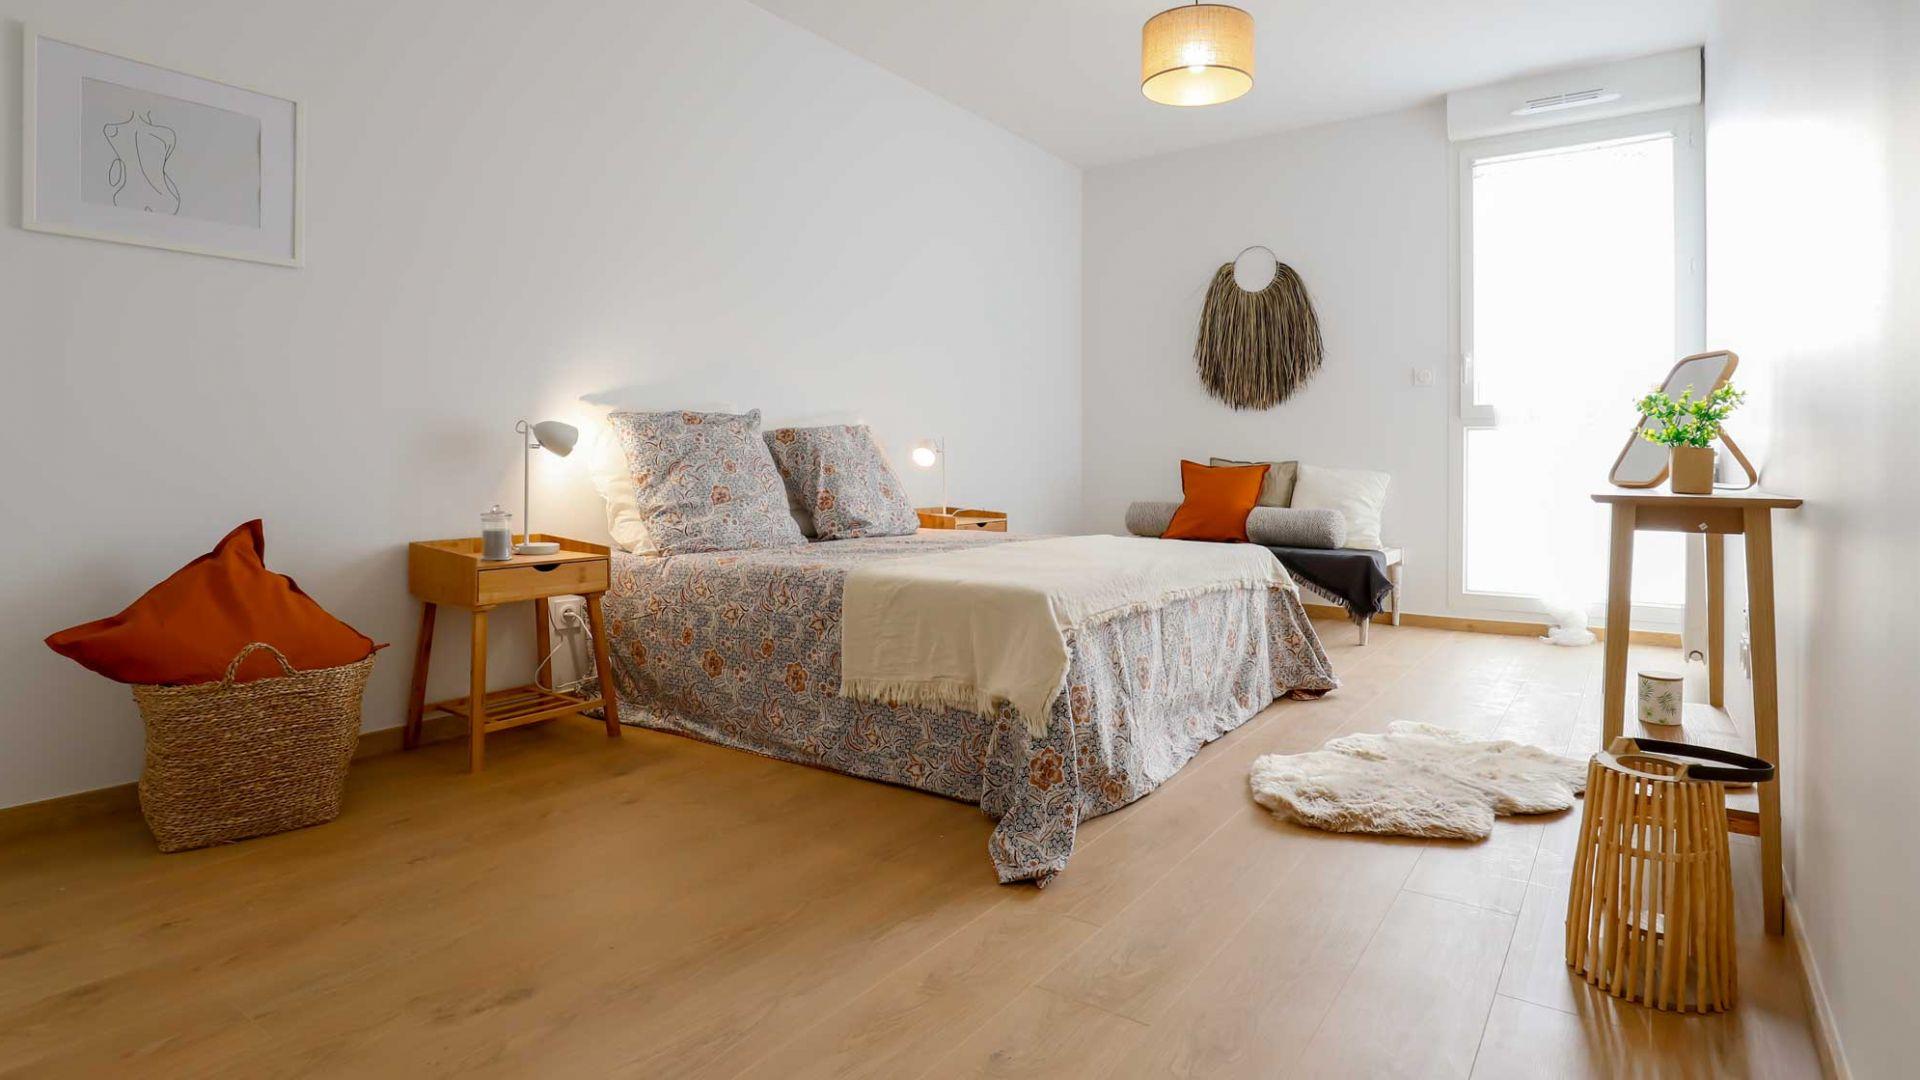 GreenCity immobilier - Blagnac-Beauzelle - 31700 - LB47 - villa T5 - chambre